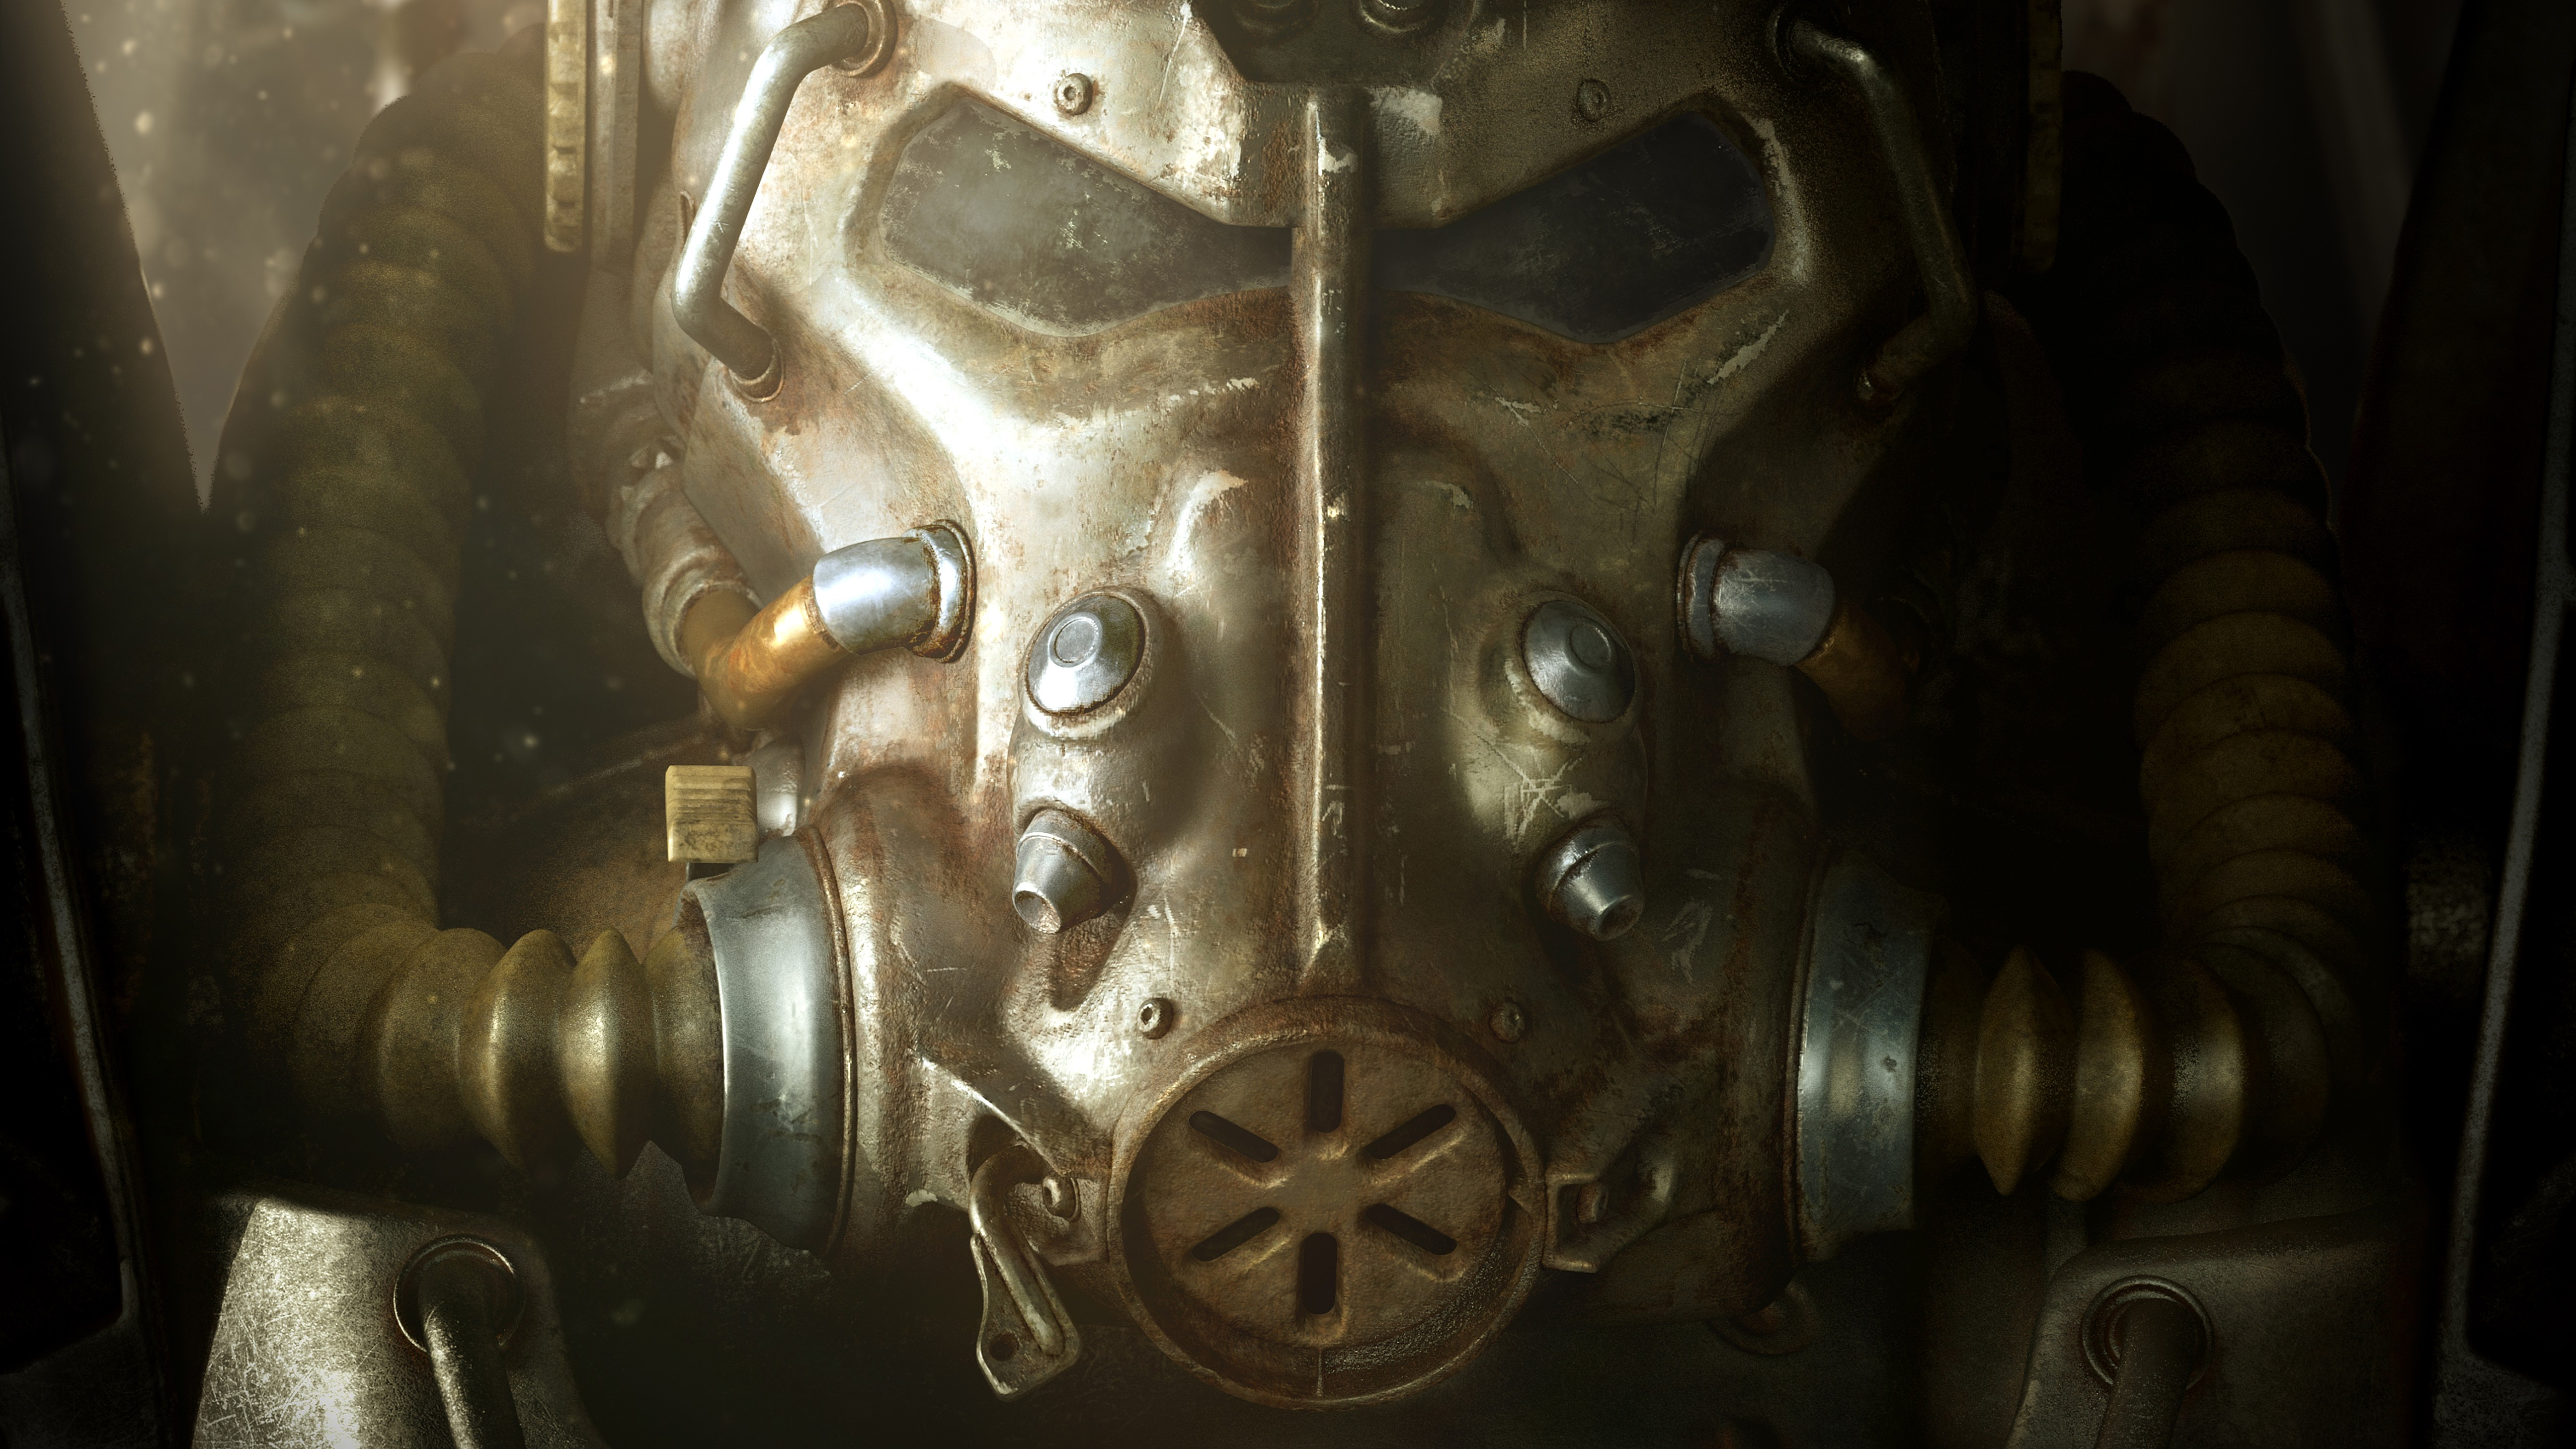 fallout 4 power armor wallpaper - photo #1